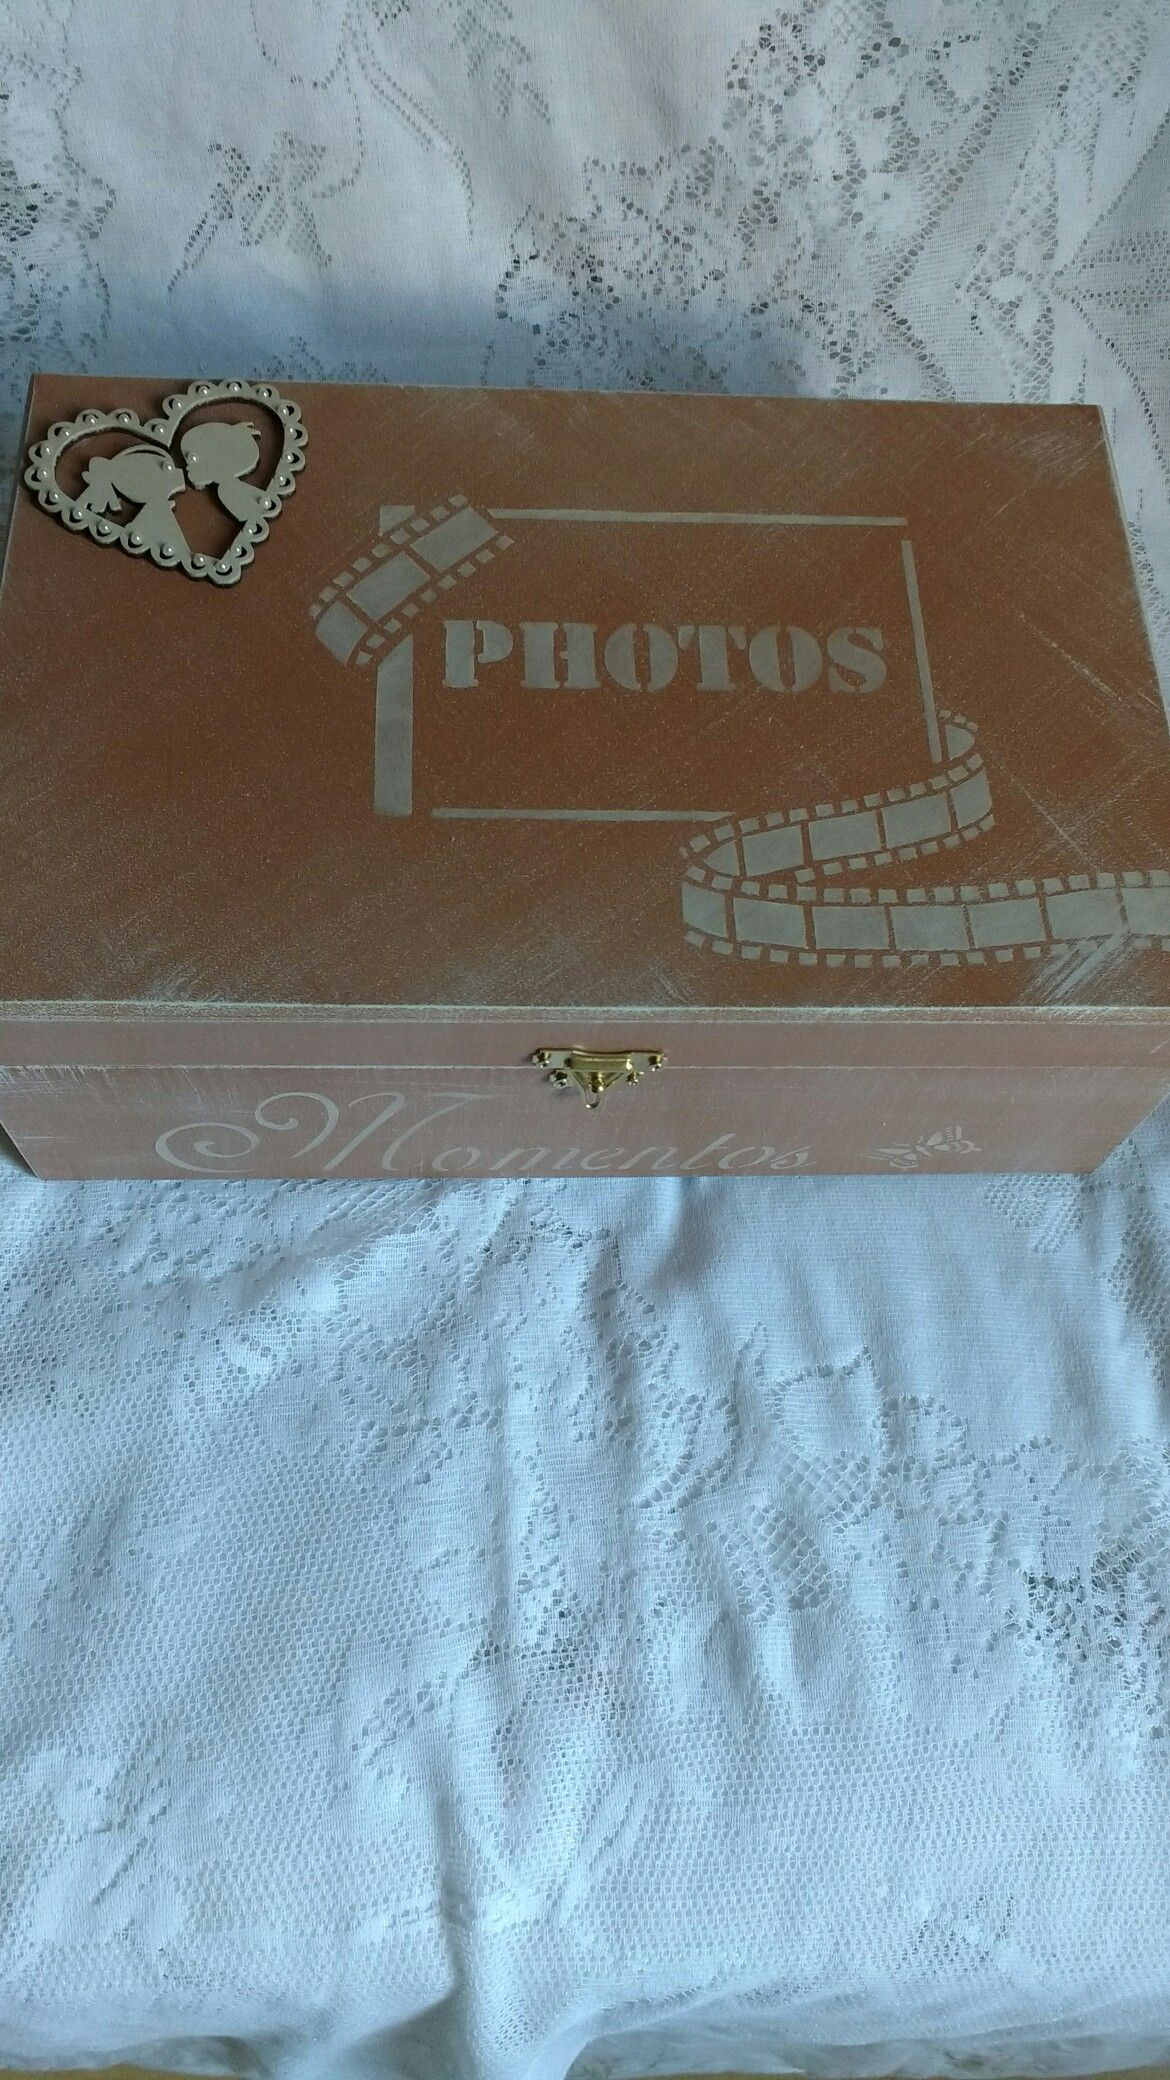 Caixa de fotos